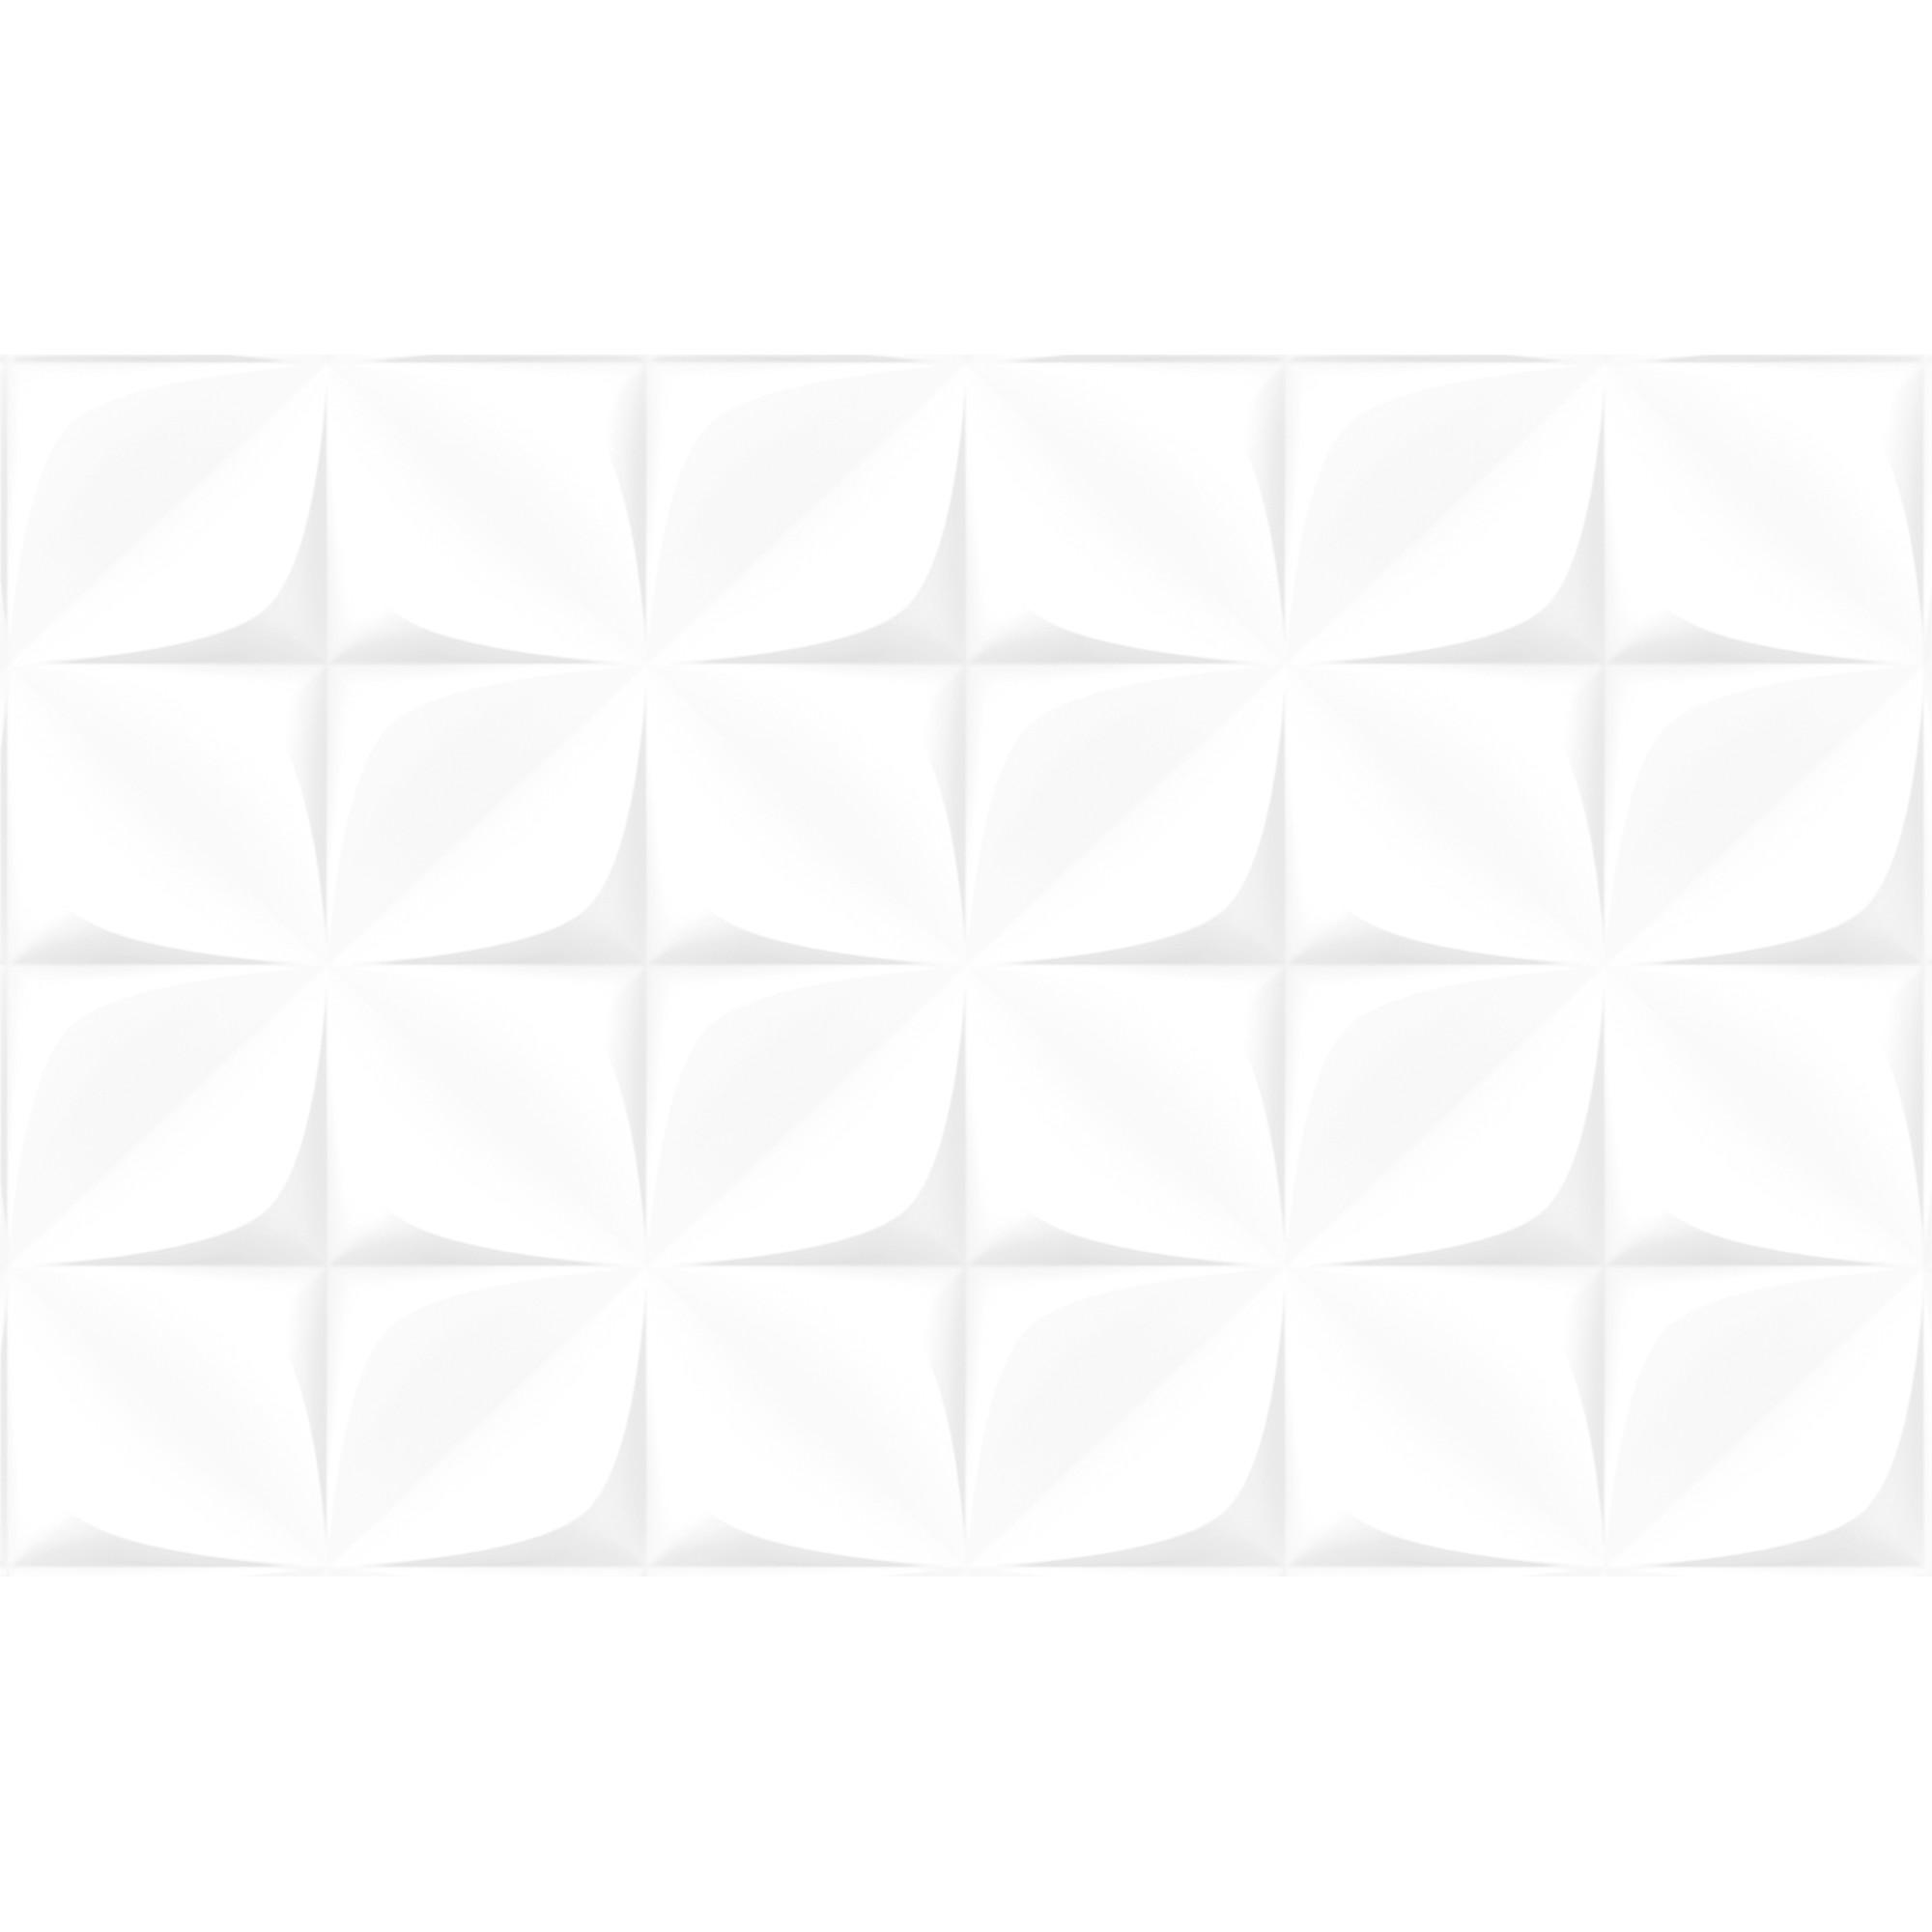 Revestimento Arielle Tipo A Branco 37x59 cm Esmaltado com Alto Relevo 239m Tecnologia de Impressao Digital HD